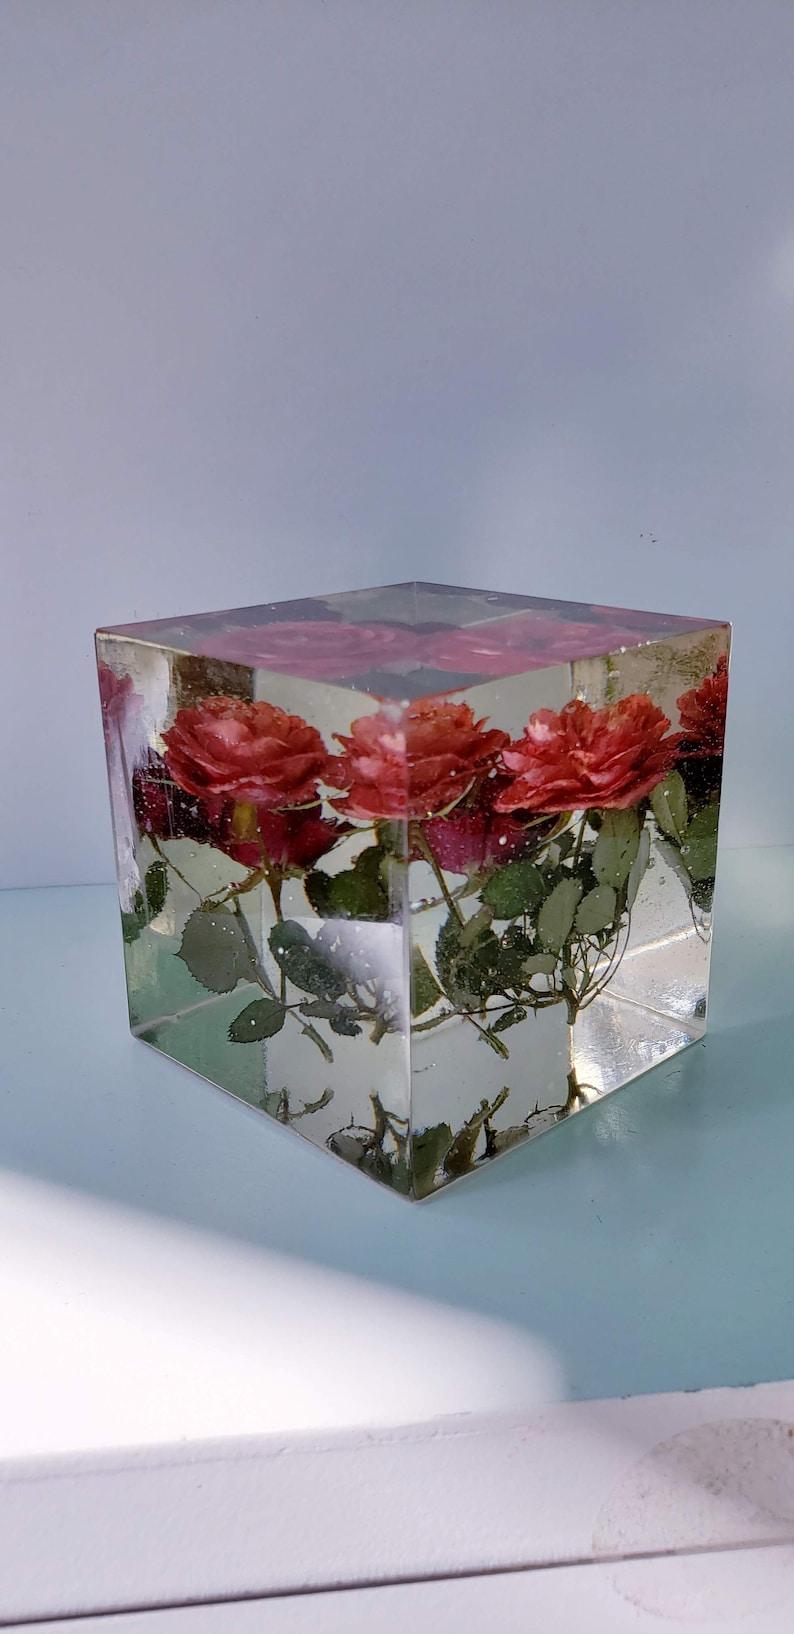 Preserving Wedding Flowers In Large Resin Cube Like Glass Paperweight Keepsake Sweet Romantic Memories Of Your Wedding Anniversary Funeral